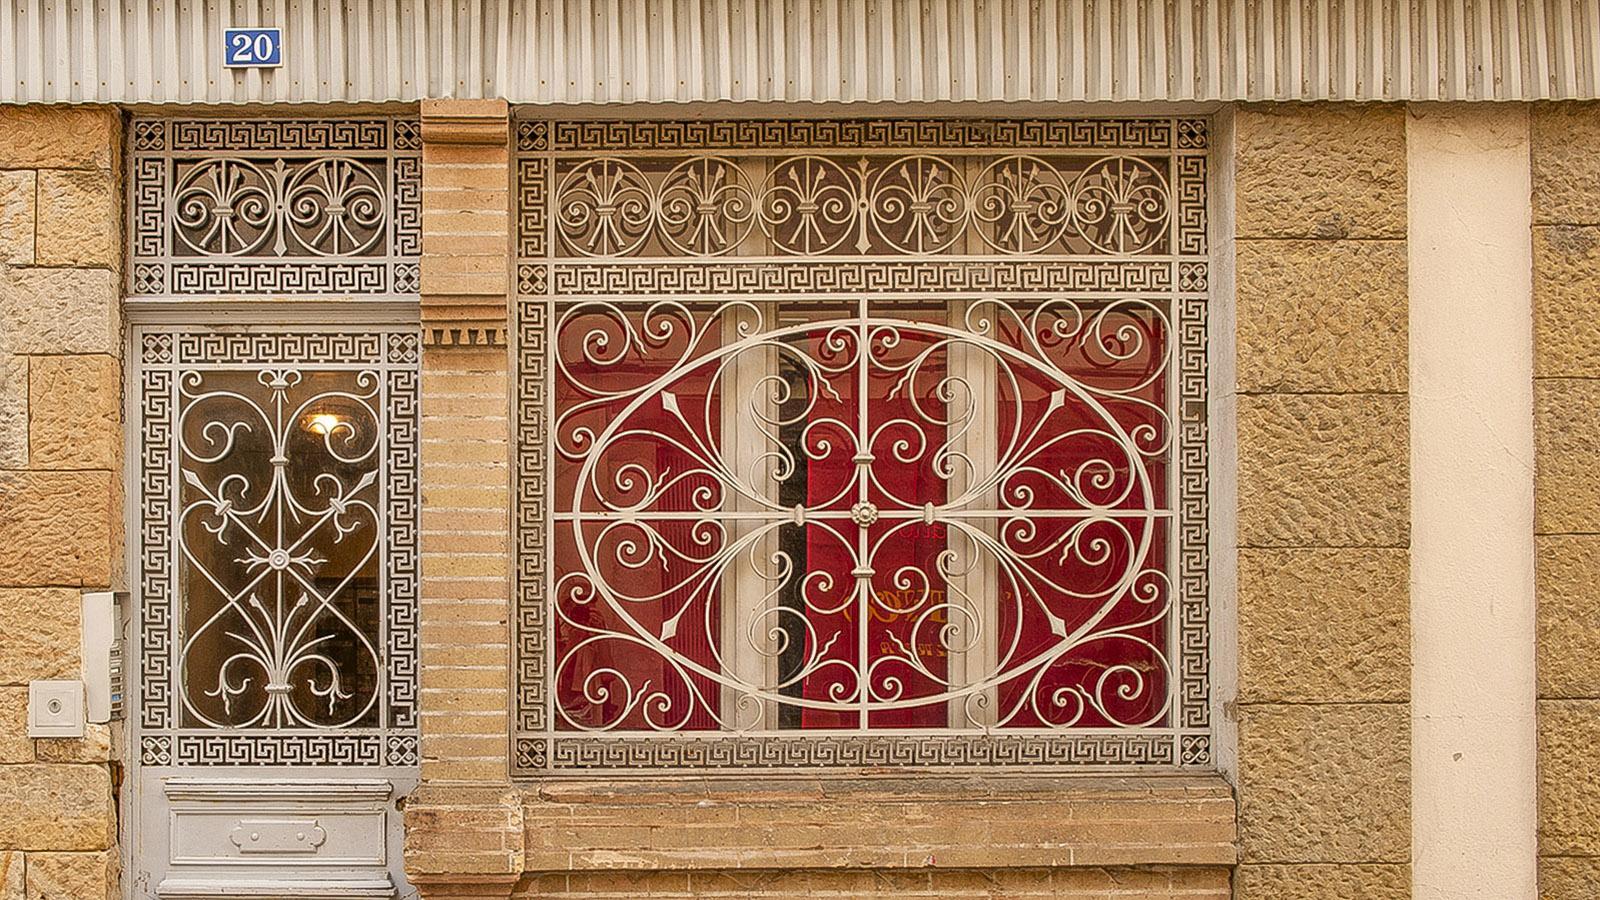 Foix: Fensterdetail in der Altstadt. Foto: Hilke Maunder